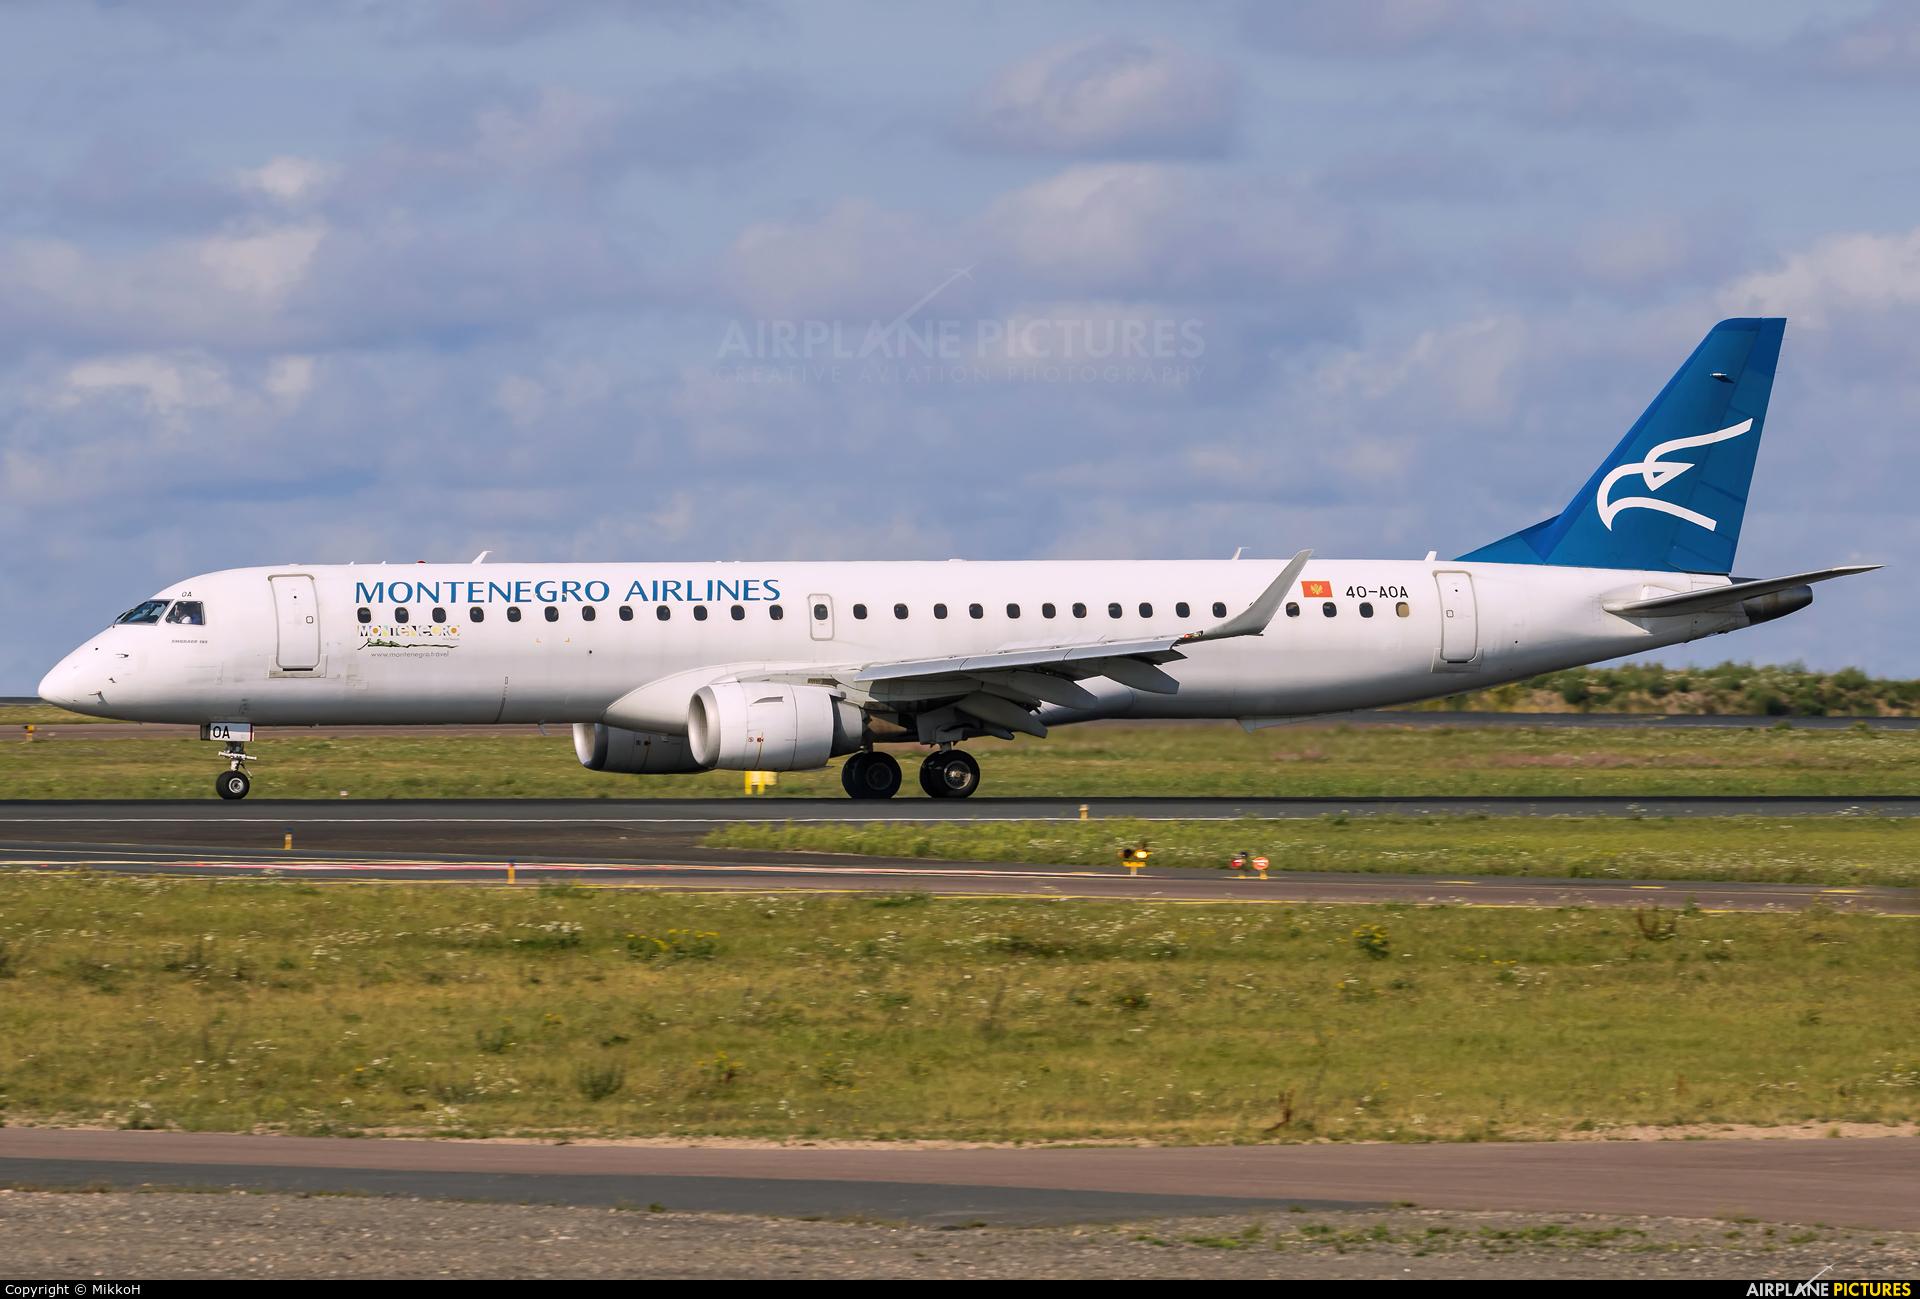 Montenegro Airlines 40-AOA aircraft at Helsinki - Vantaa